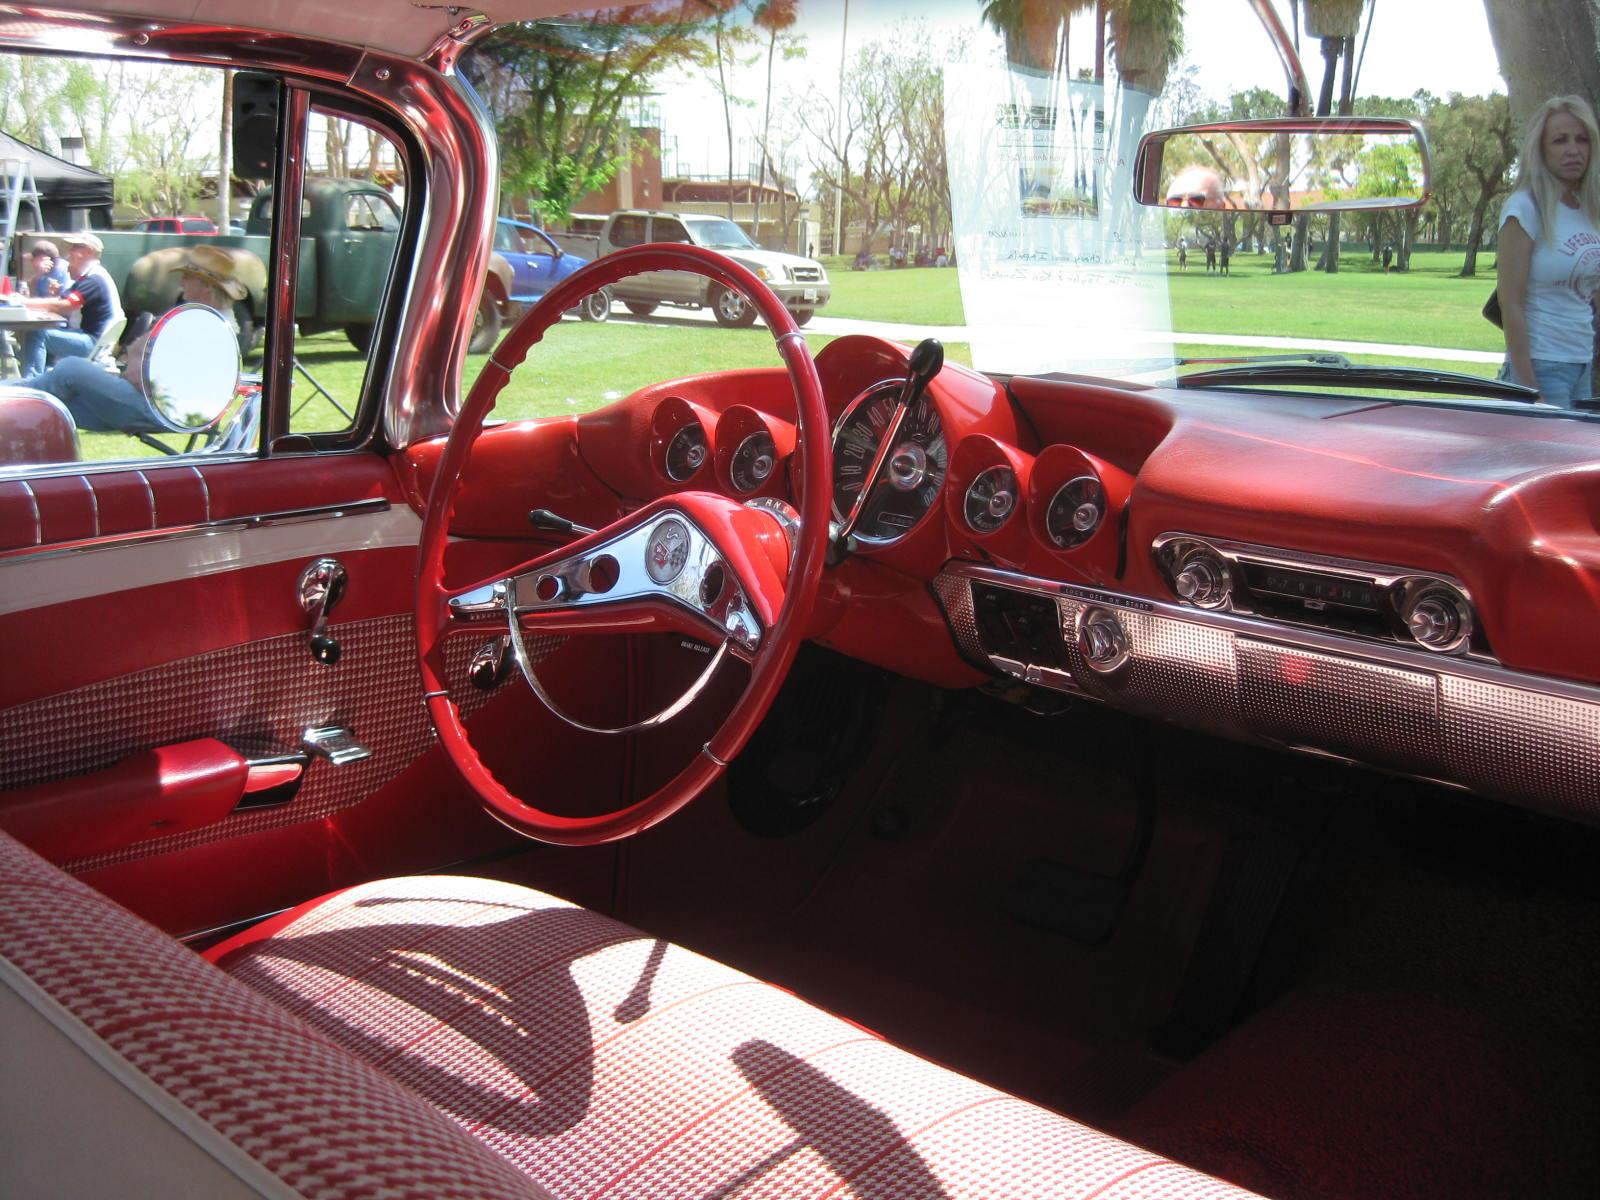 1960 Chevy Impala Red Interior Car Interior Design